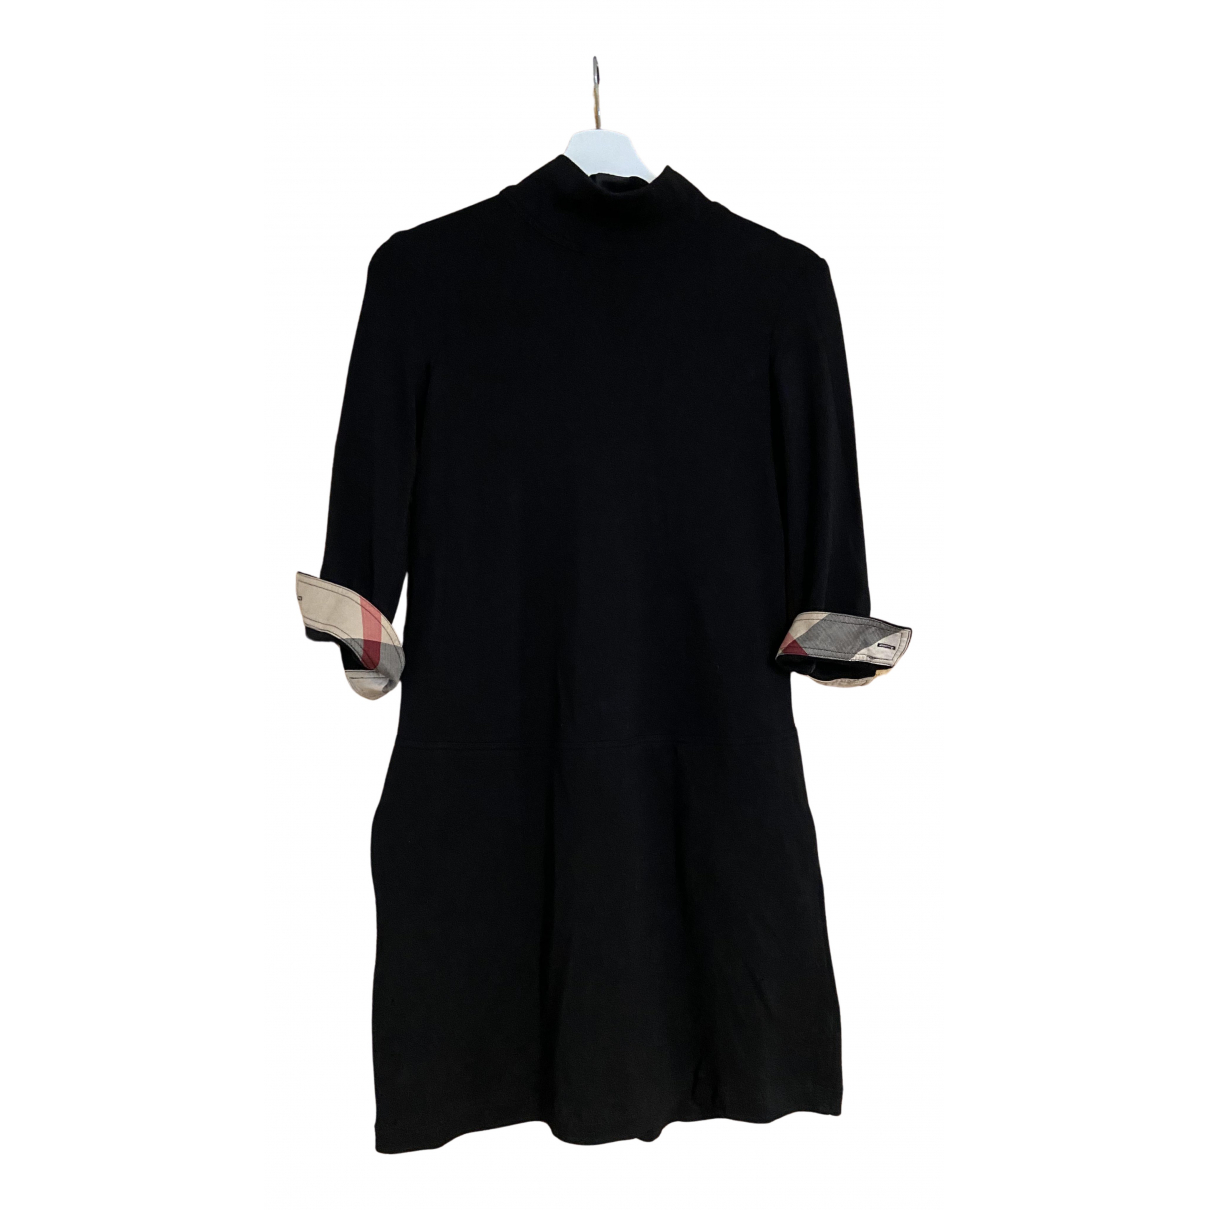 Burberry \N Kleid in  Schwarz Kaschmir